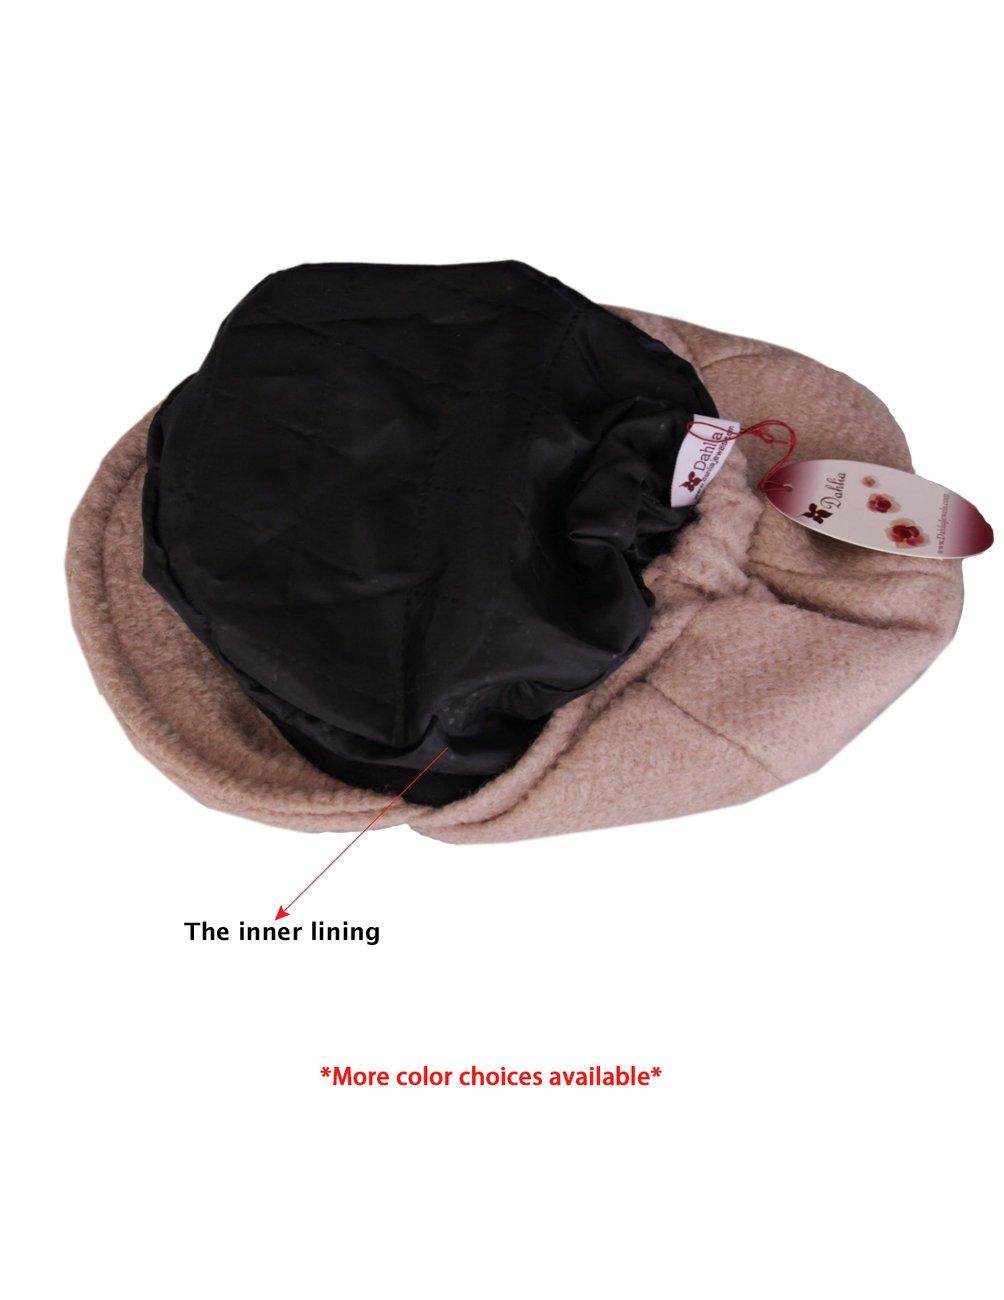 Dahlia Women's Chic Flower Newsboy Cap Hat Wool Blend - Dual Layer, Black by Dahlia (Image #5)